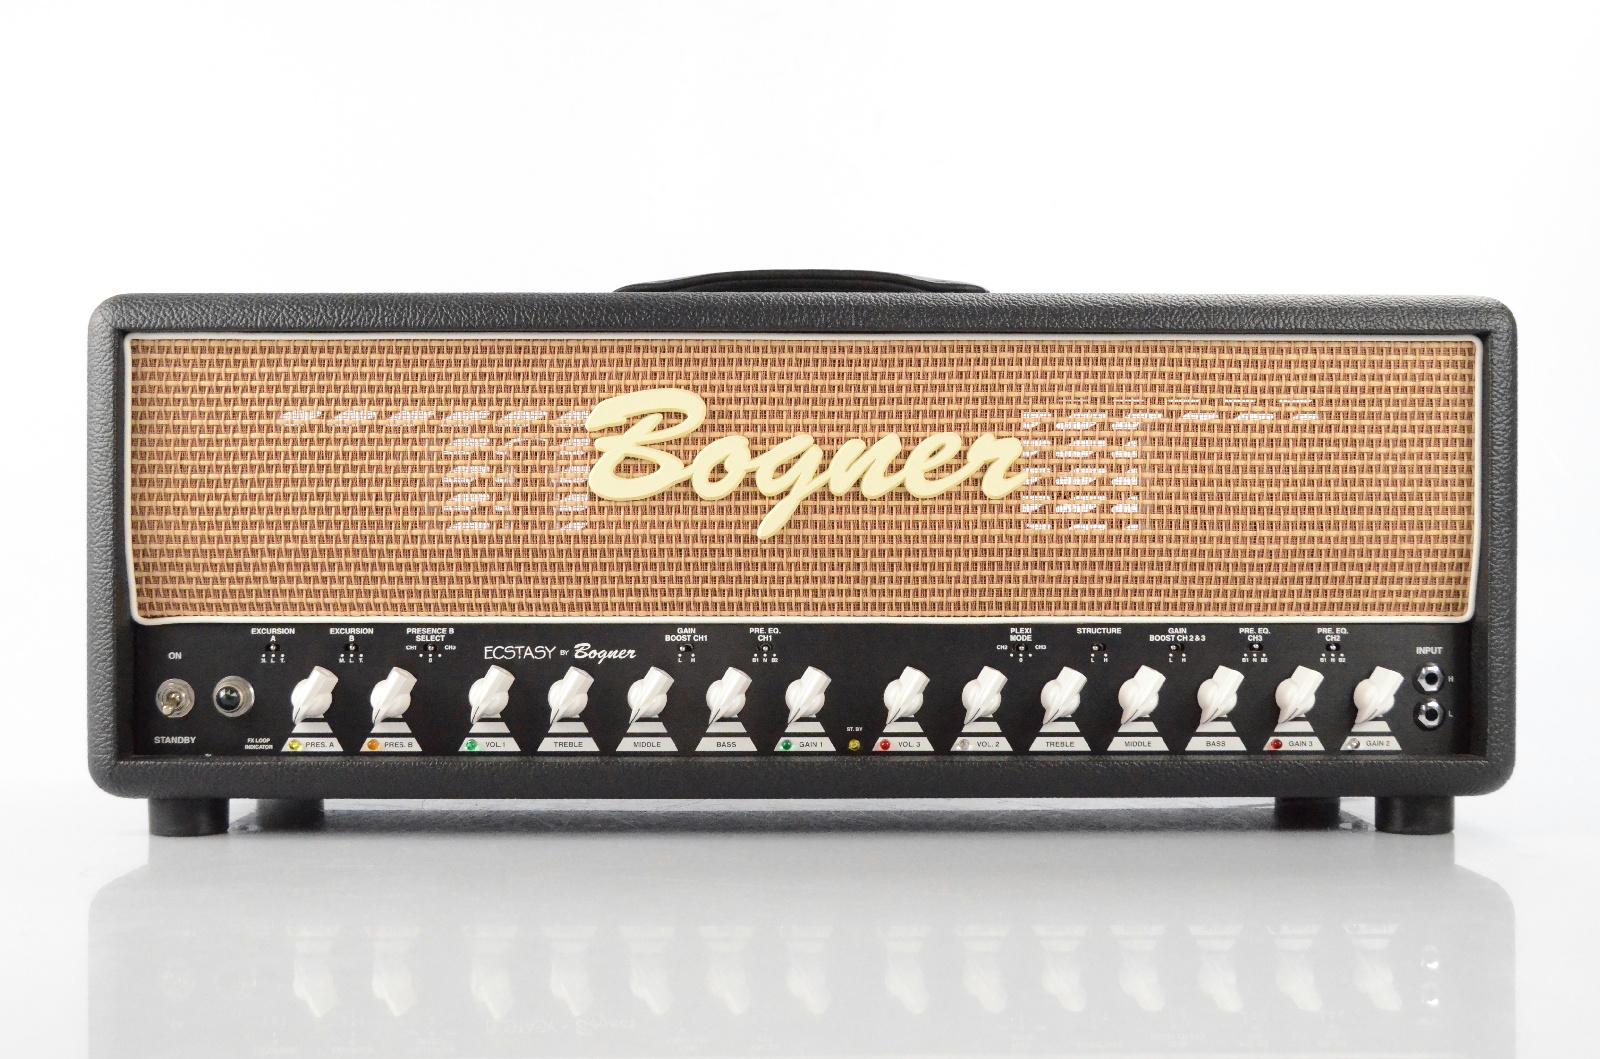 Bogner Ecstasy 100 Watt Tube Valve Guitar Amplifier Amp Head & Footswitch #32486